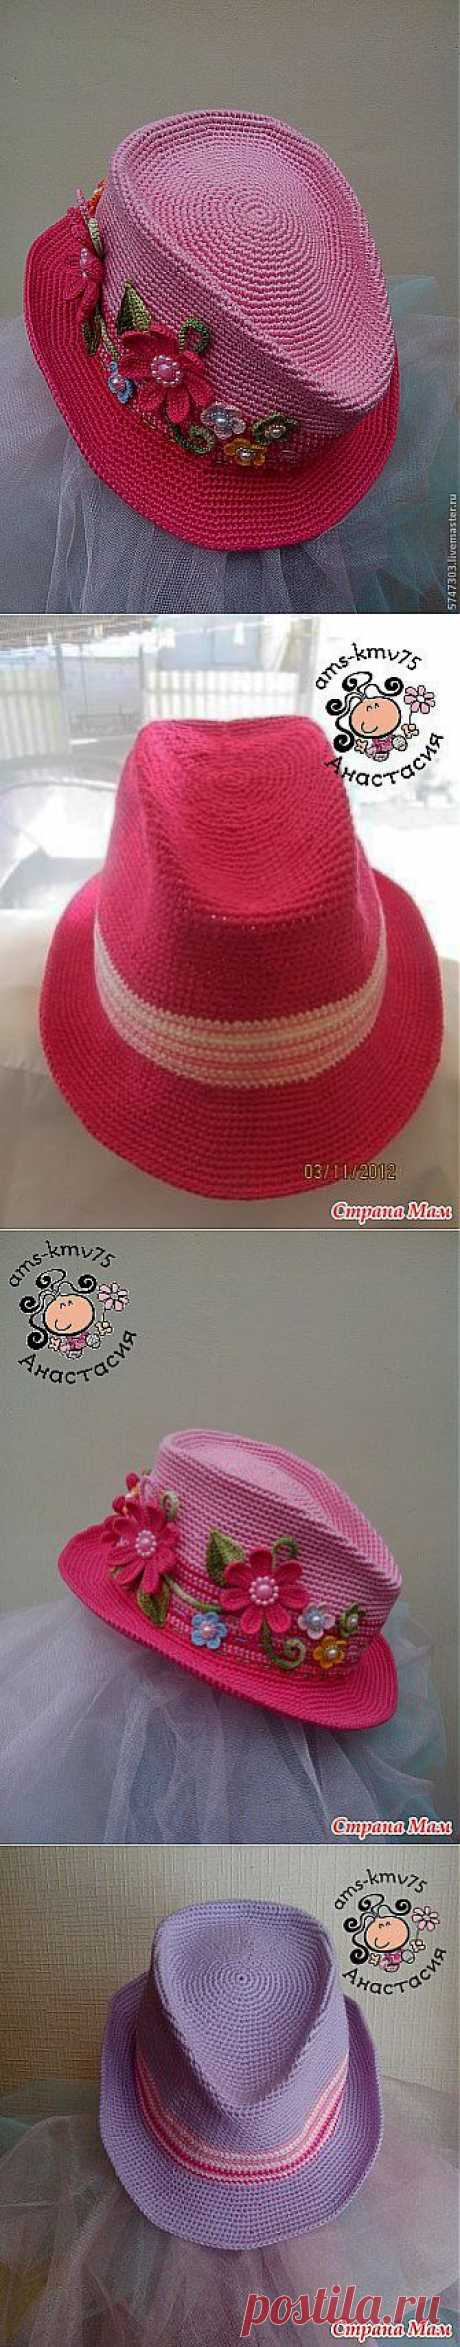 "Шляпа ""а-ля мужская"" описание мужской шляпы"